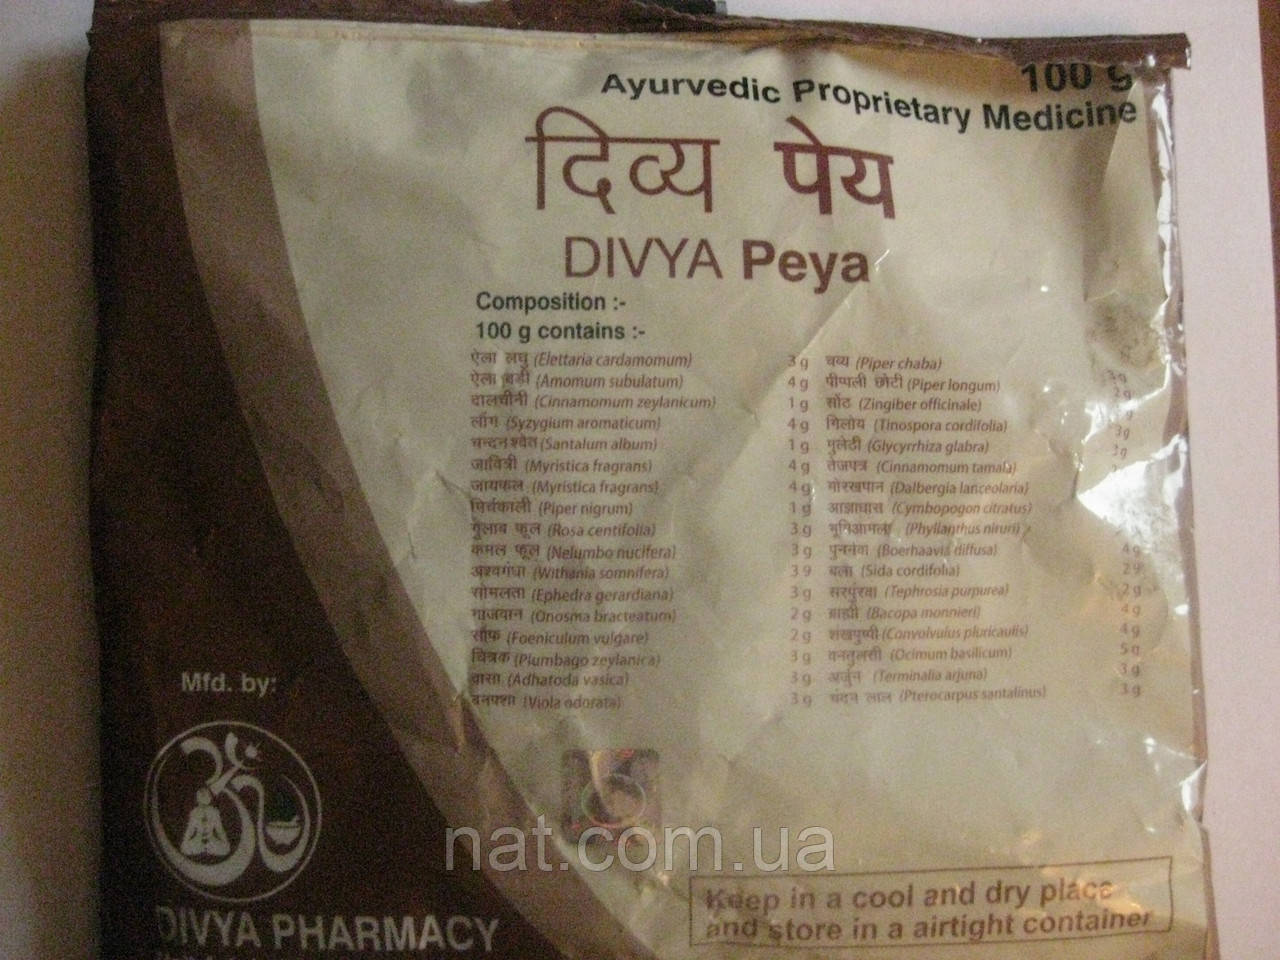 Чай индийский травяной Divya Peya (Patanjali) 100 г